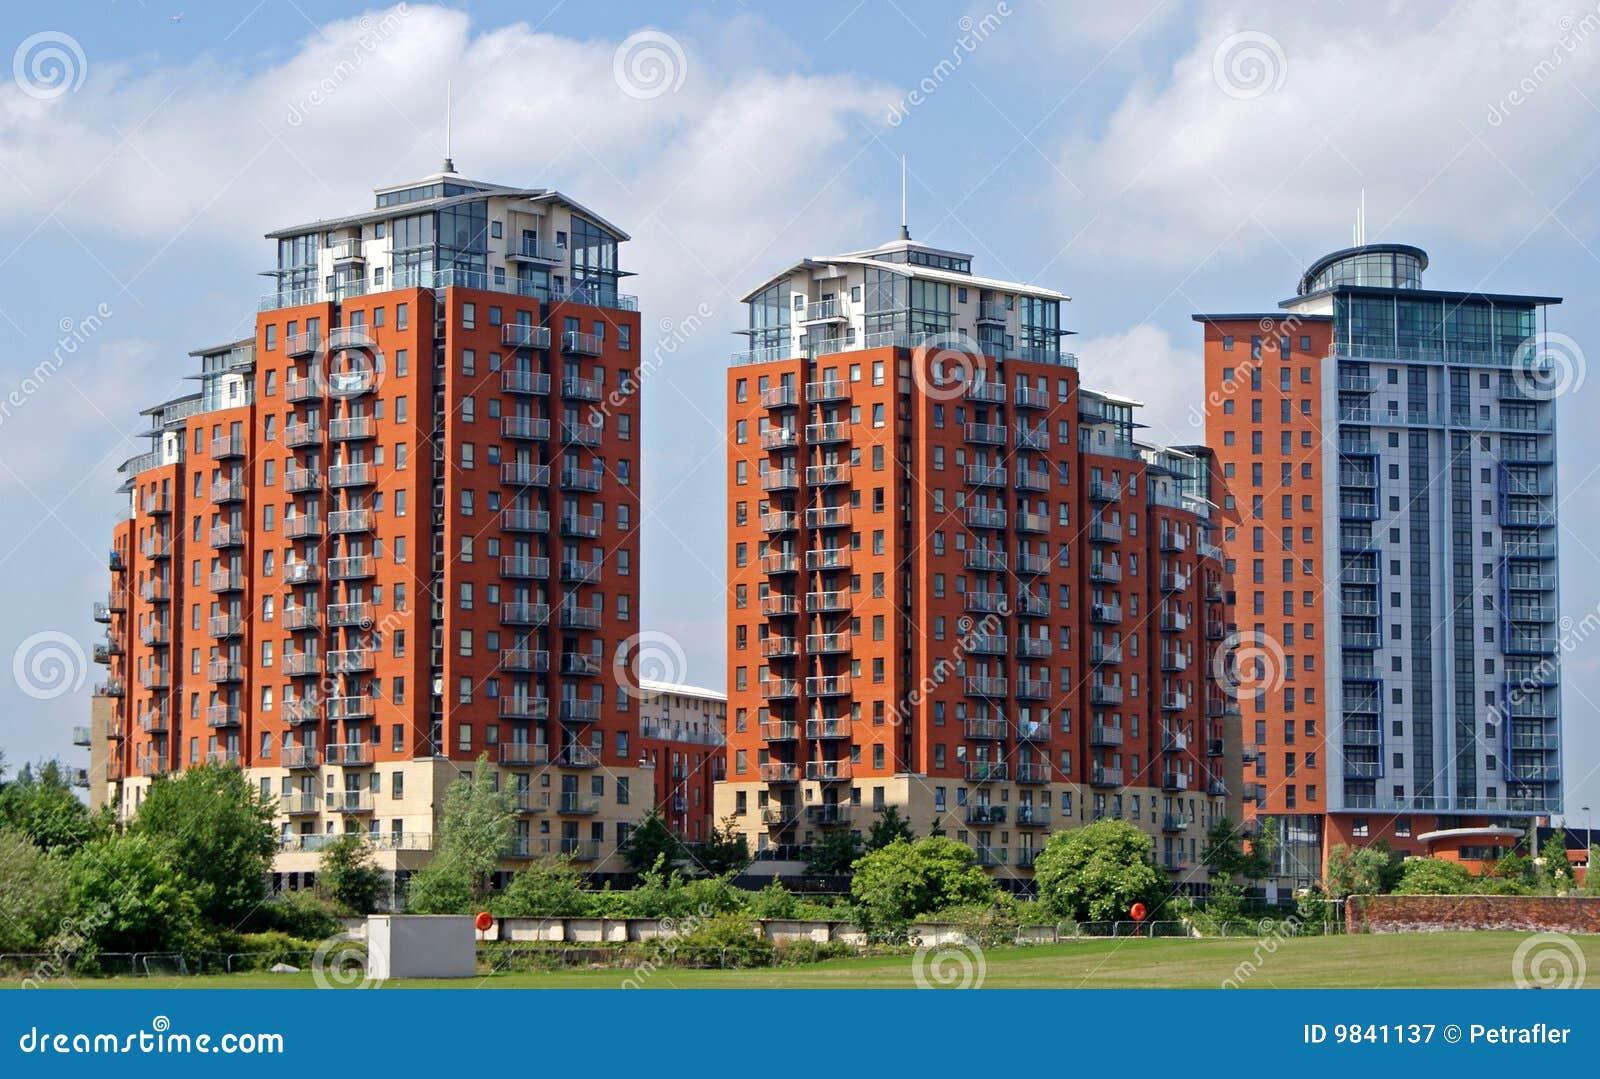 palazzine di appartamenti moderne immagine stock